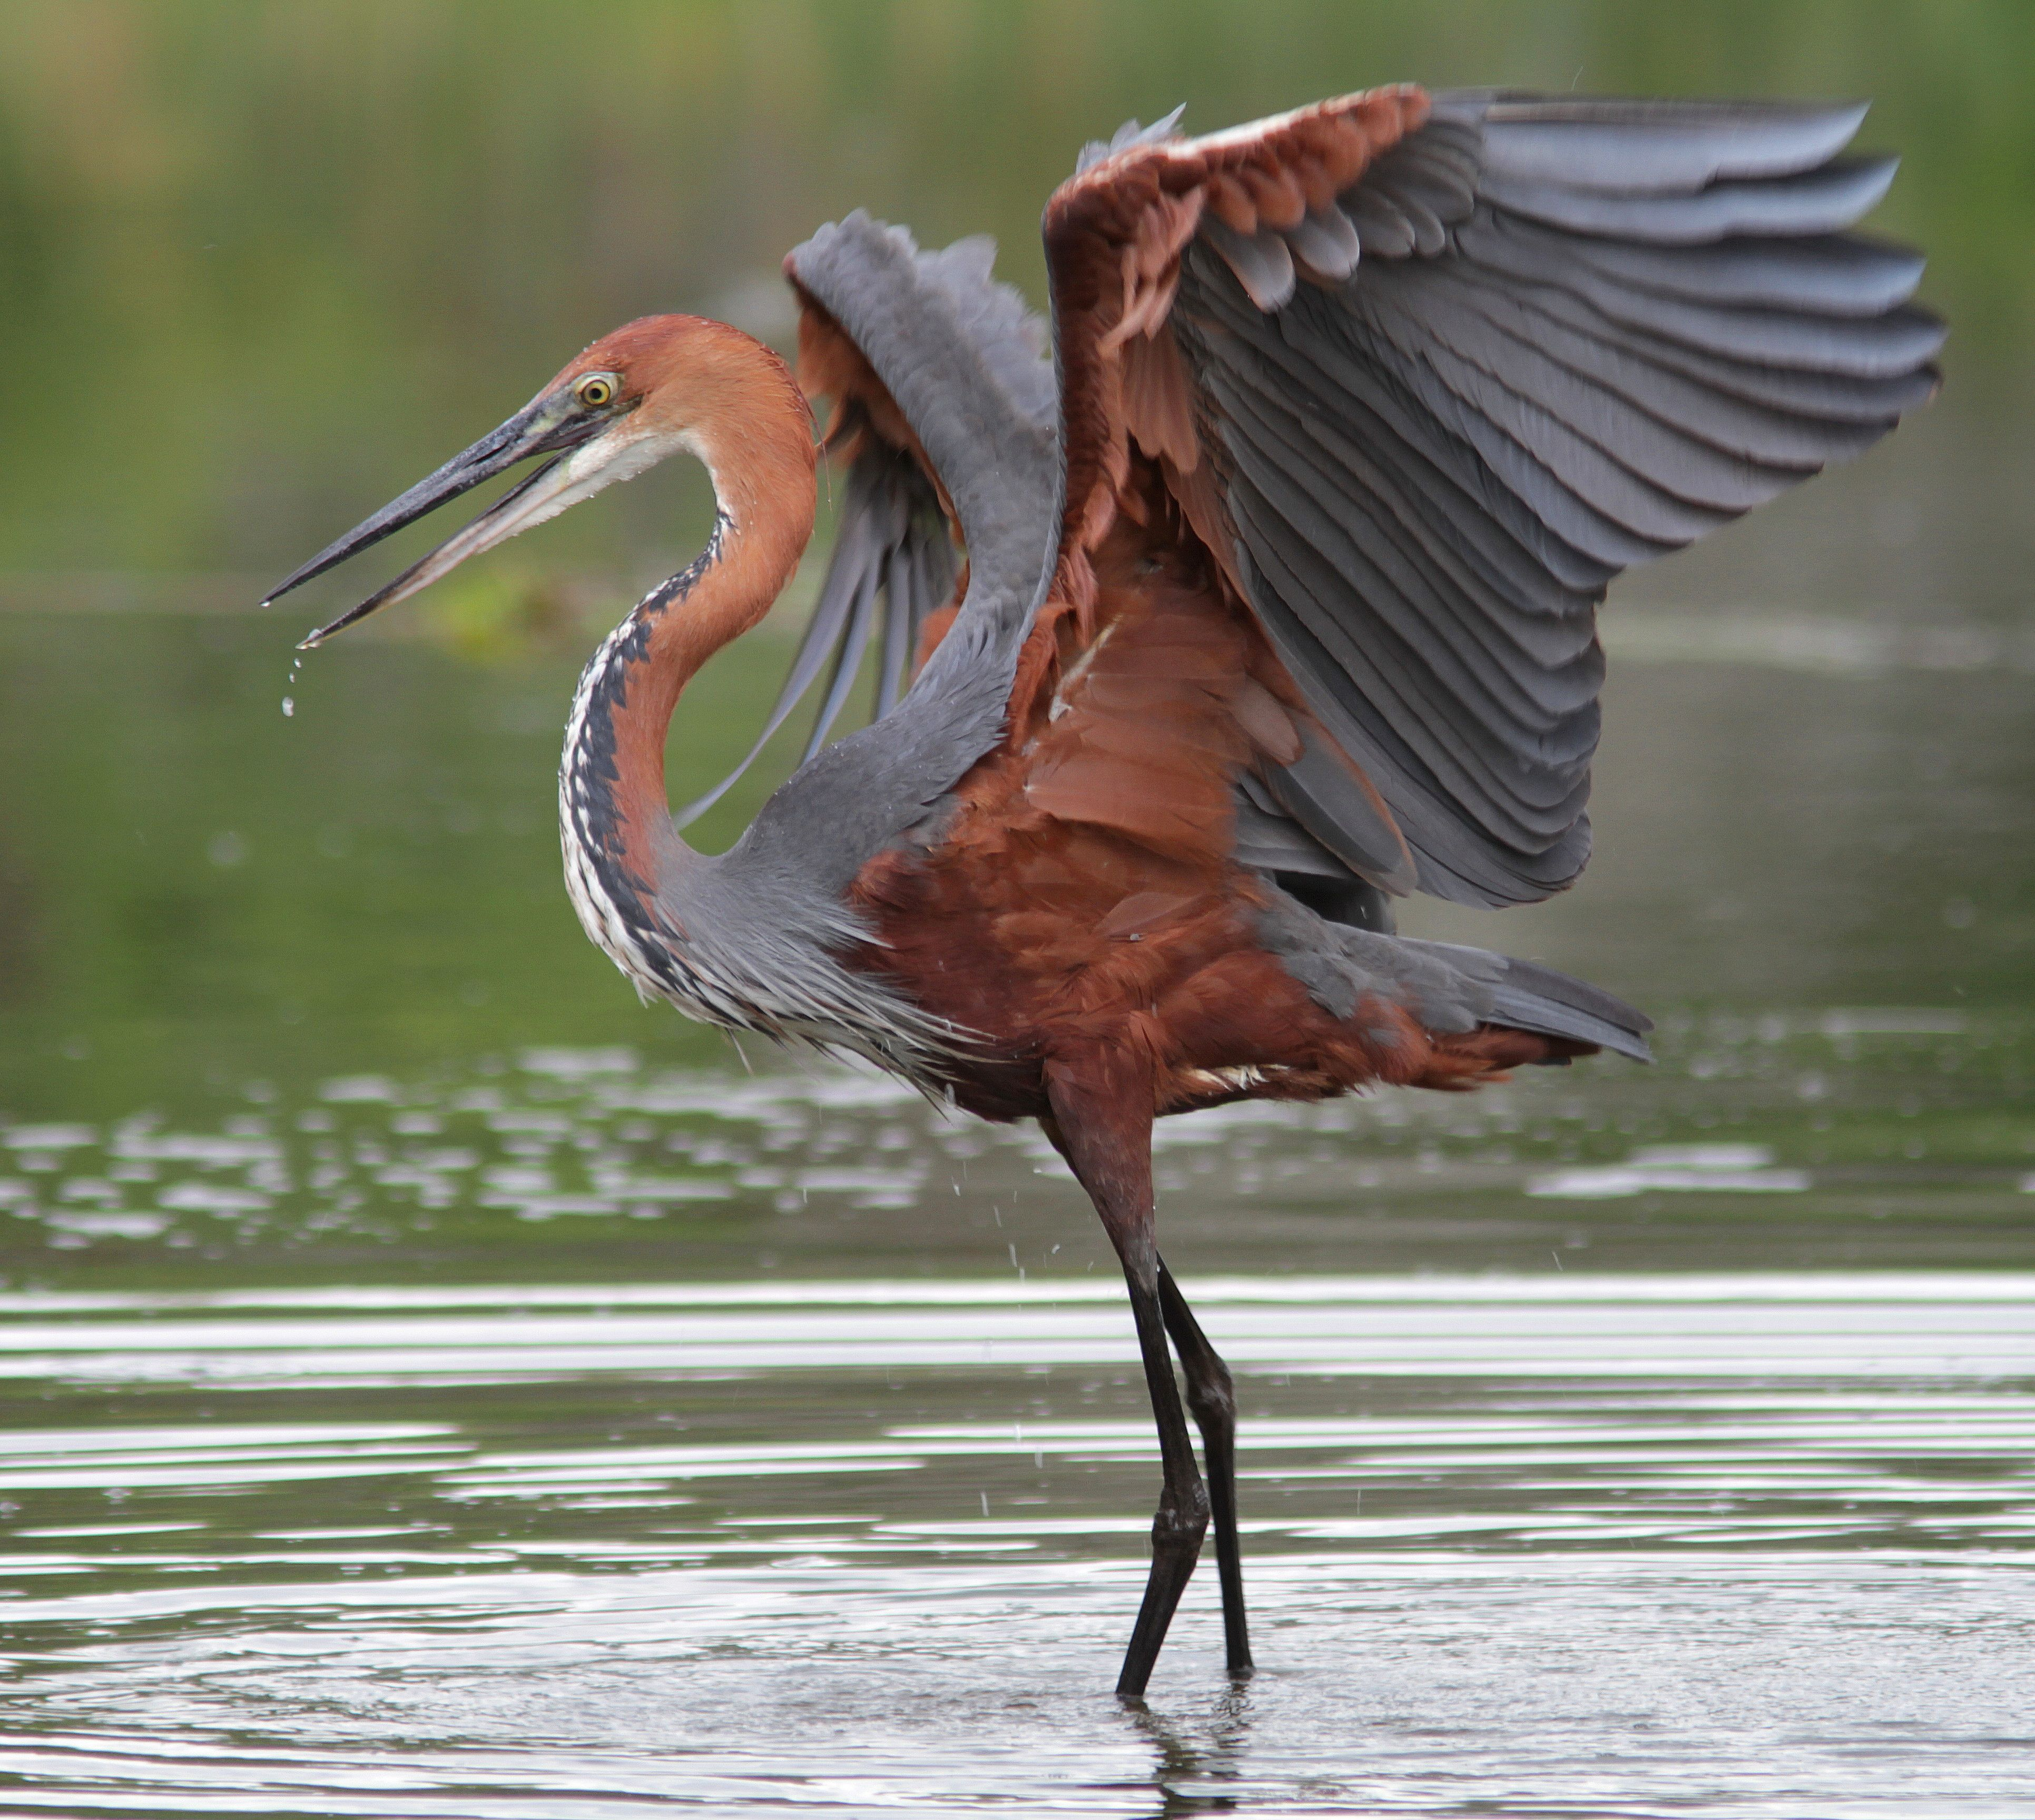 Goliath Heron (Ardea goliath) | Nature birds, Pet birds, Beautiful birds